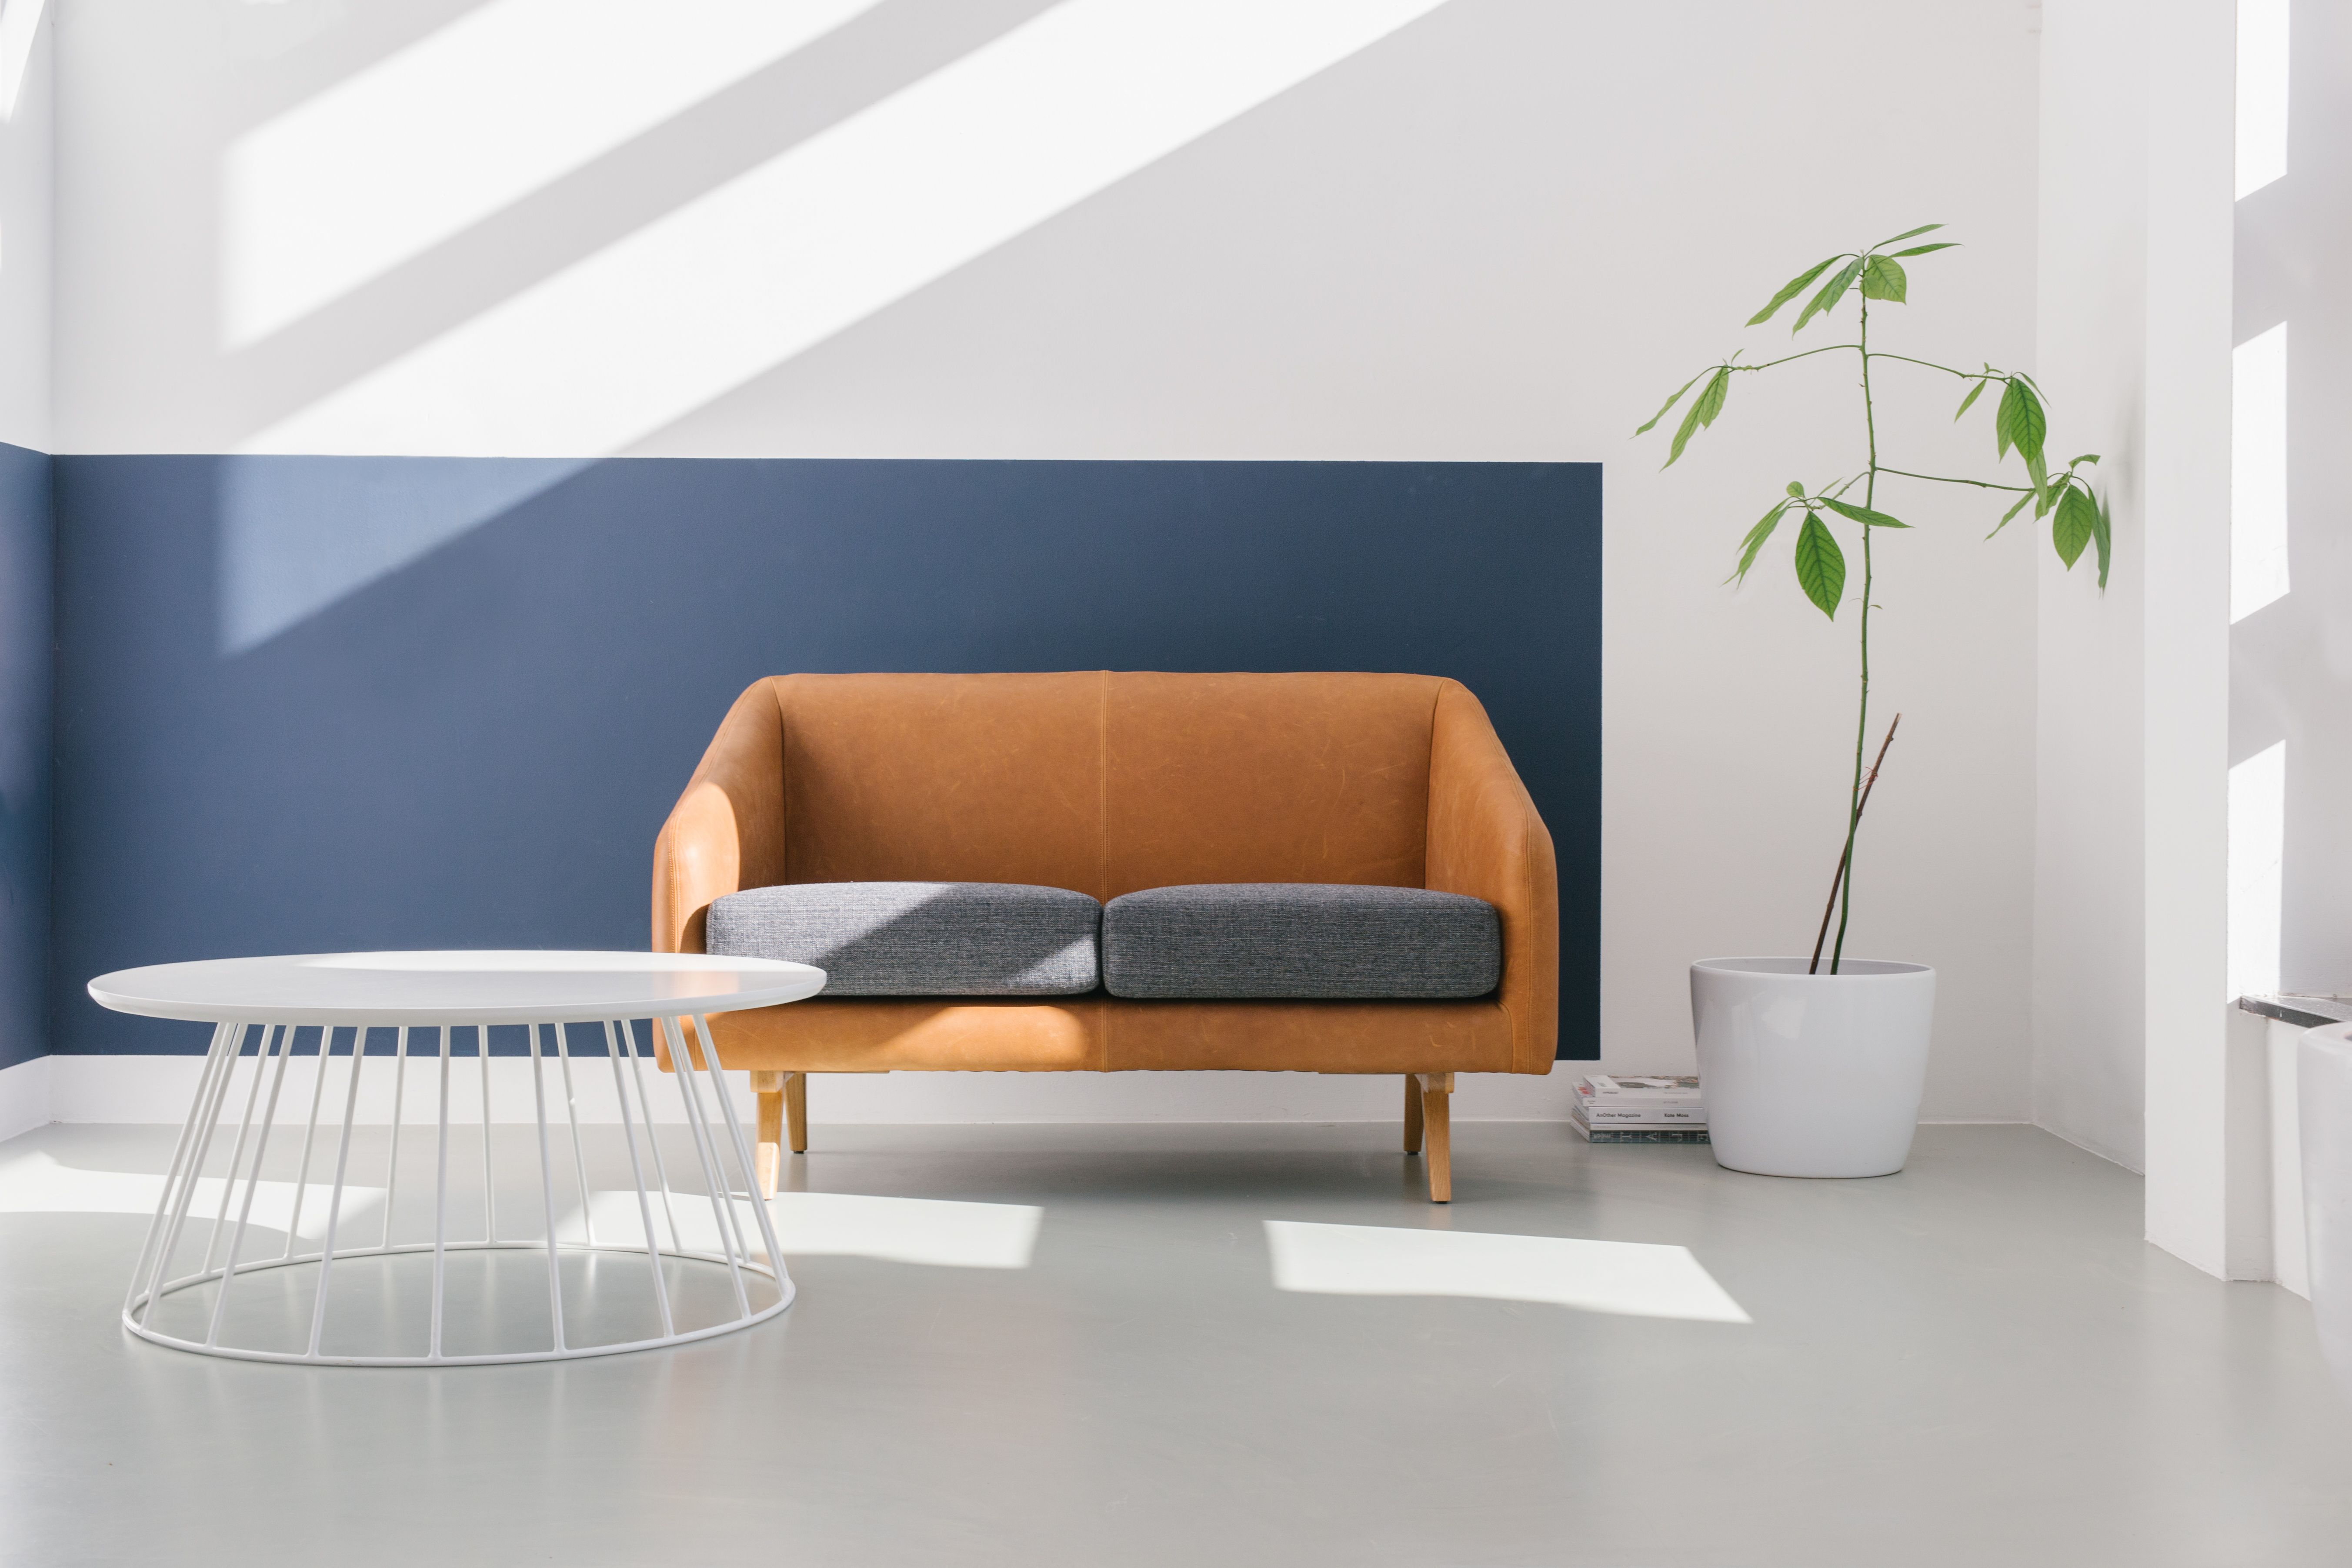 sofa company nl kivik cushion covers pin by heather heng on furniture setting pinterest leather myra in https sofacompany com